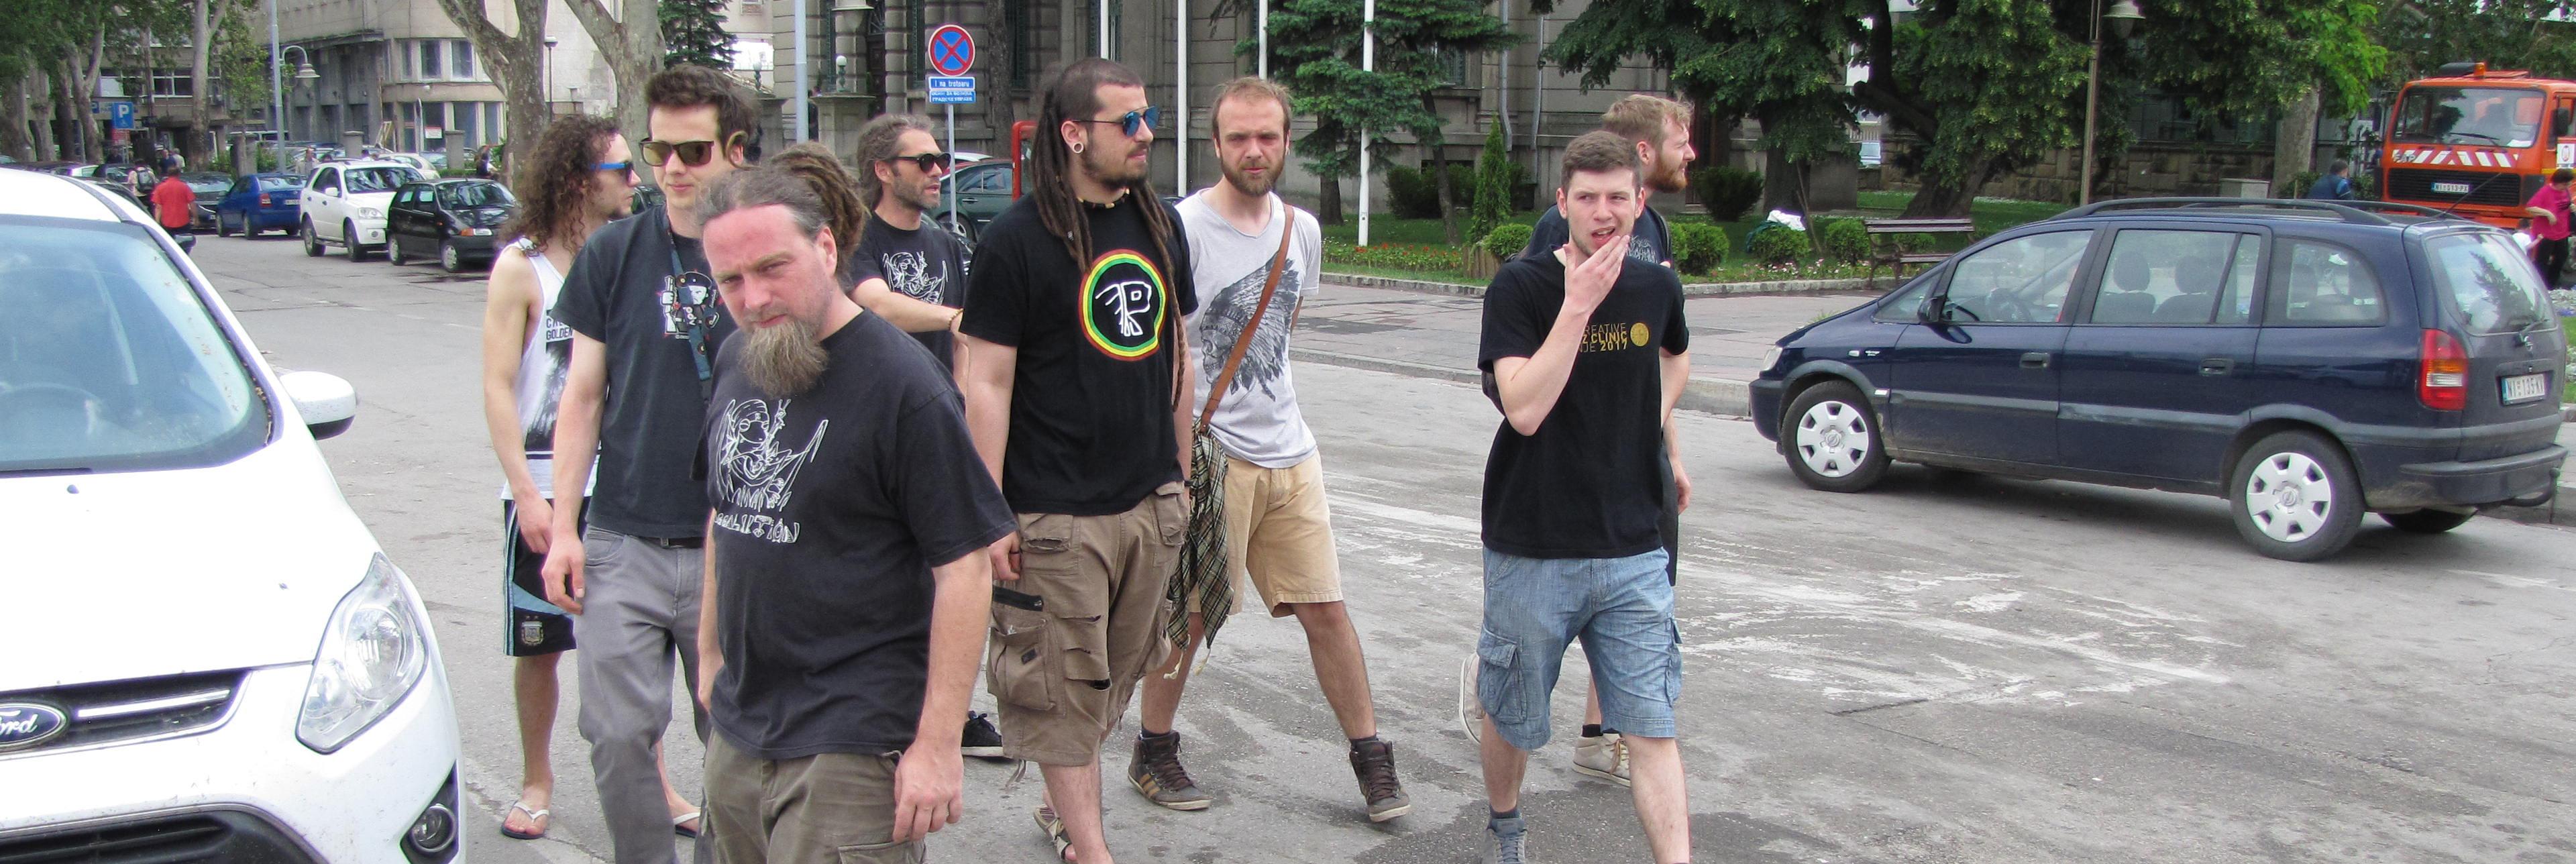 Raggalution in Kragujevac